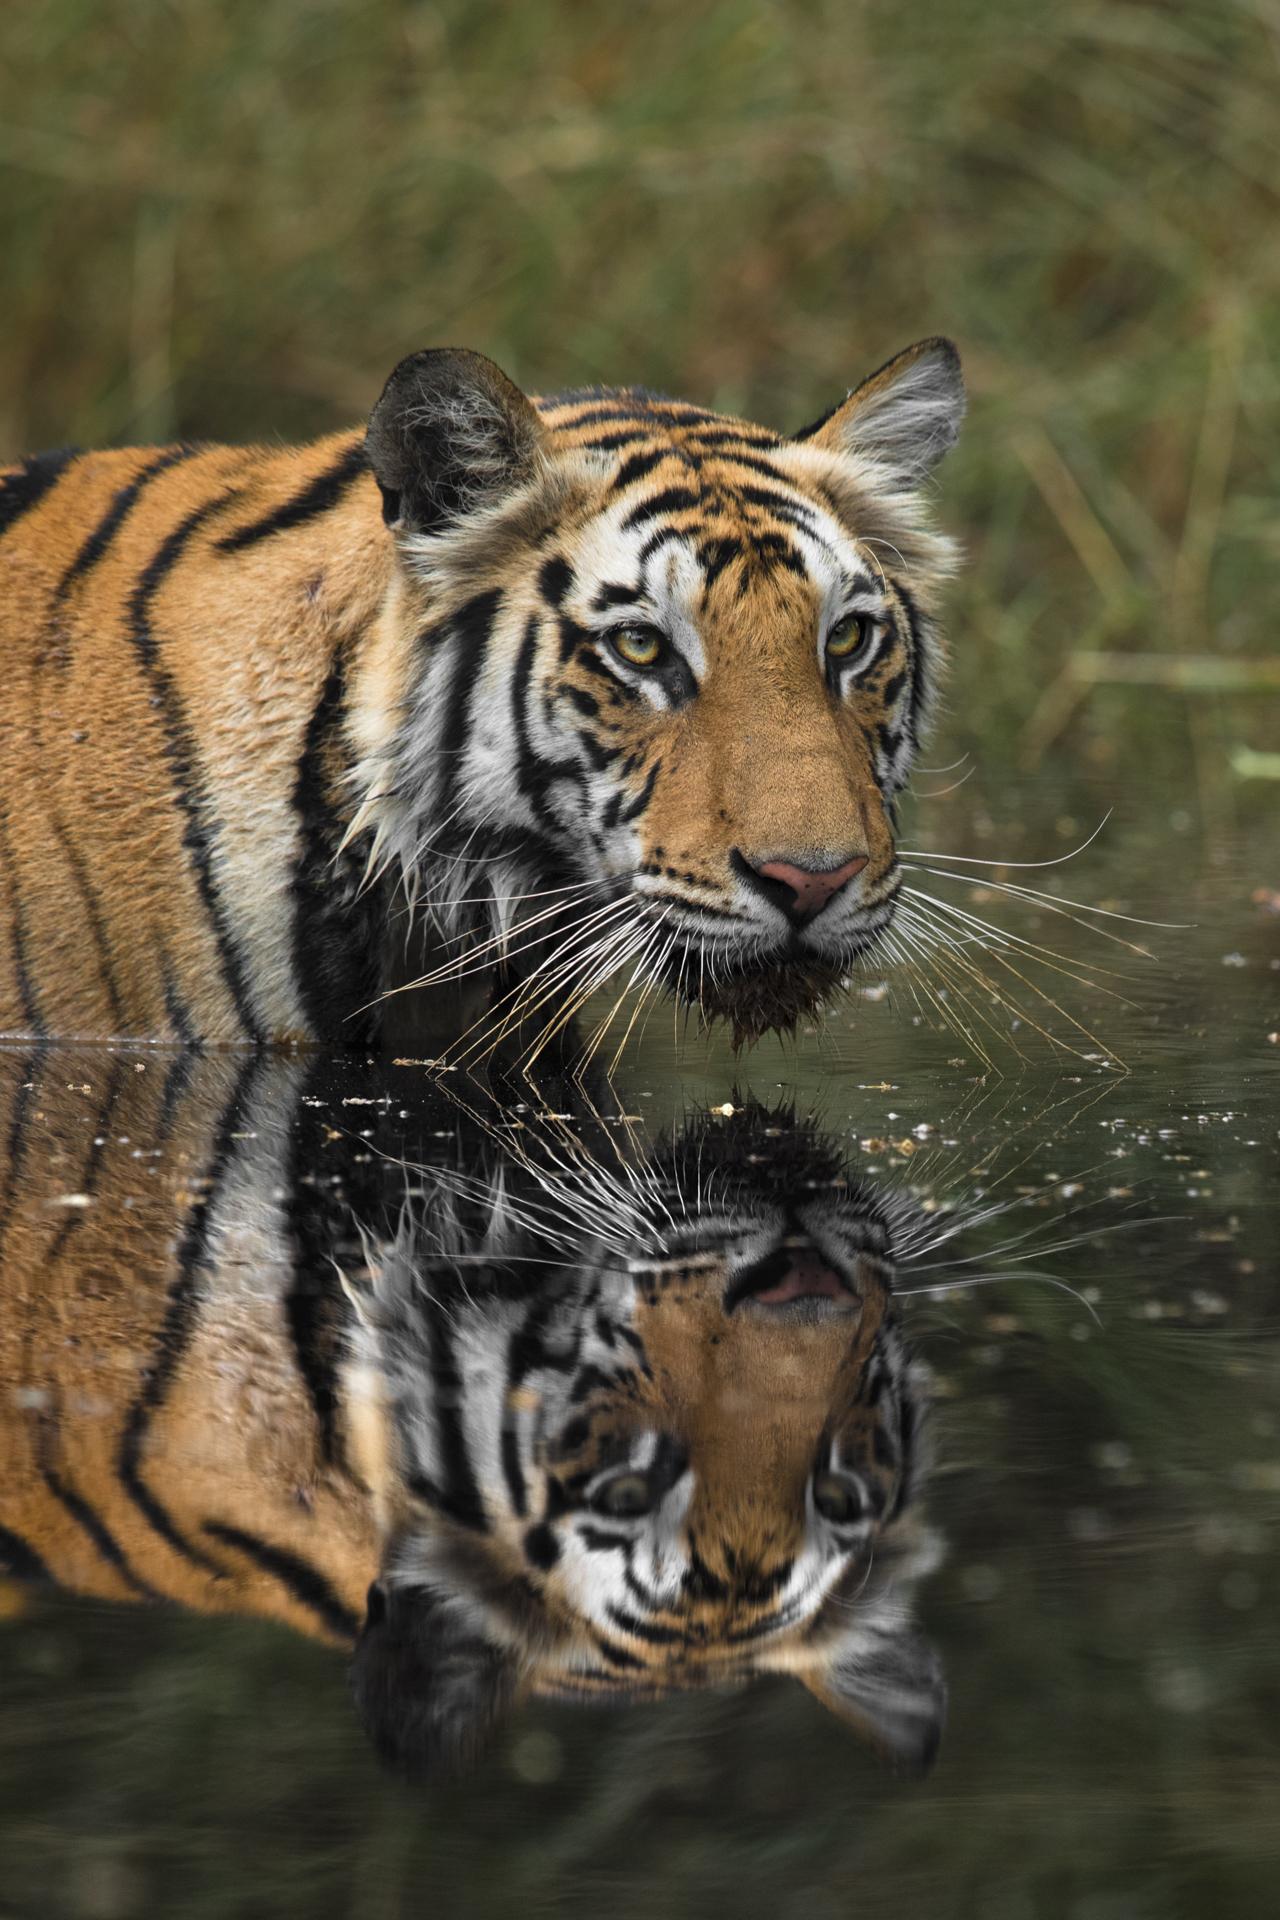 Ankit_Kumar_Tiger_Reflection_Portrait.jpg